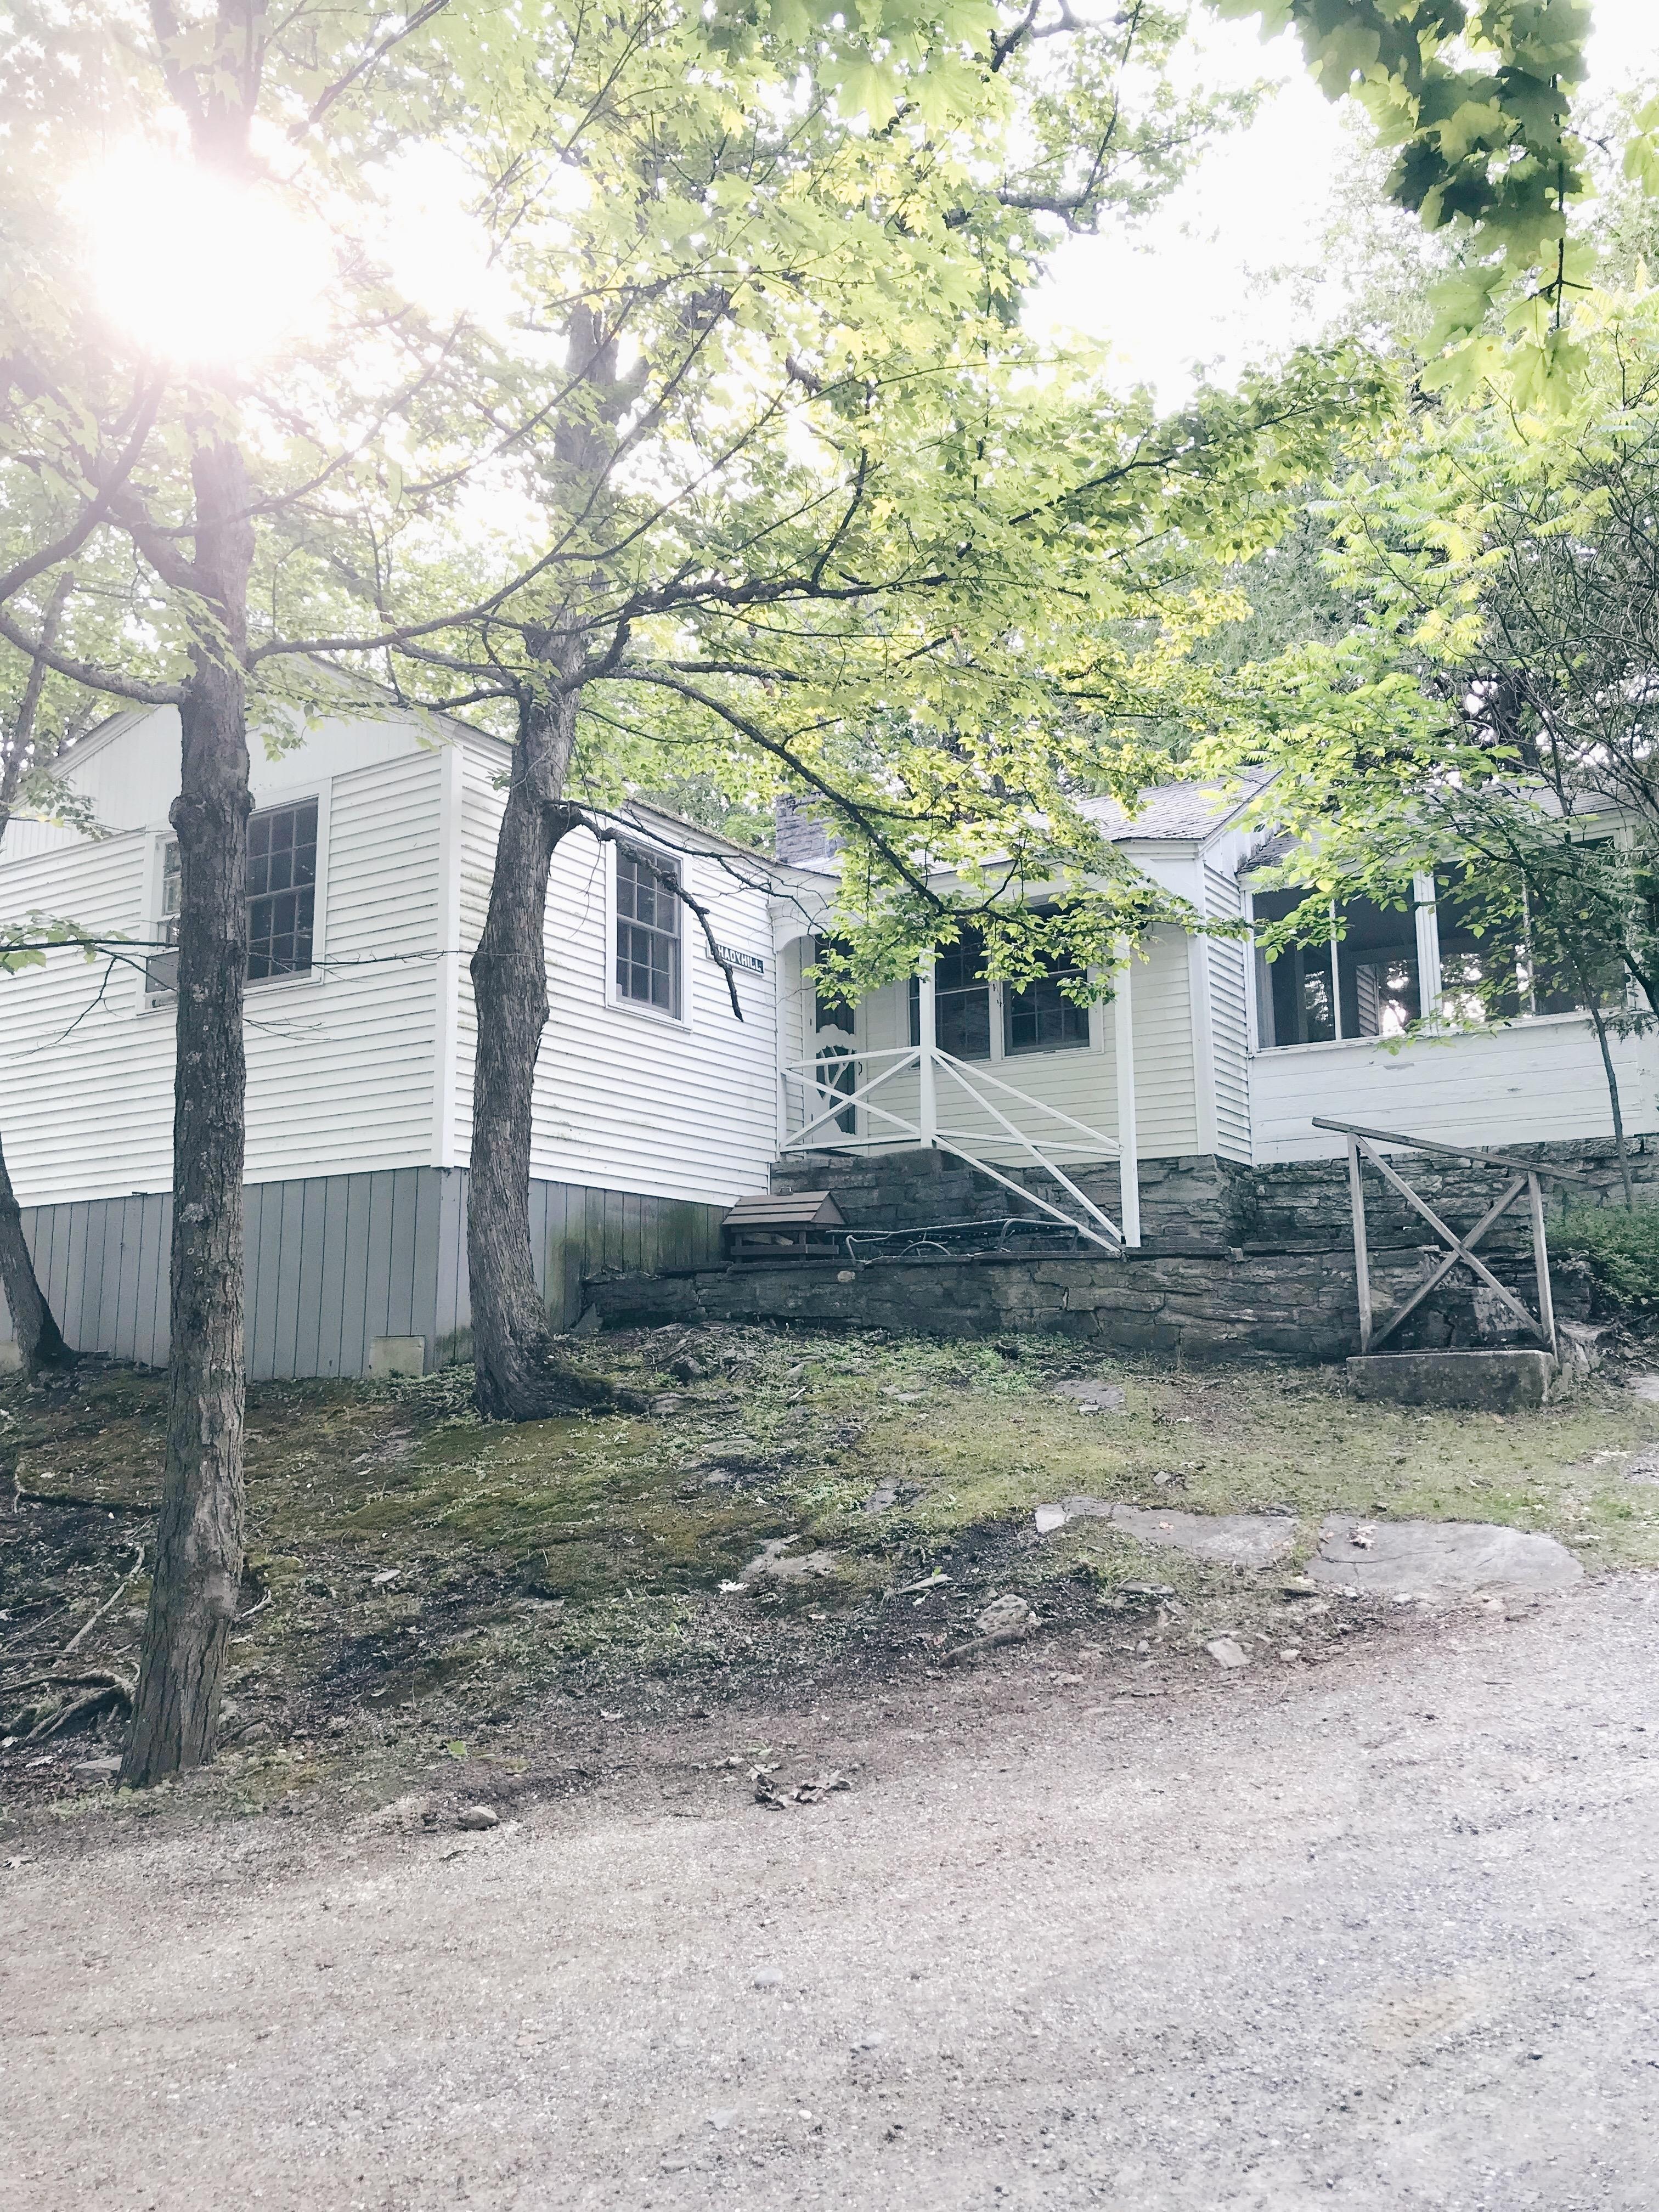 Basin Harbor Resort Review - Adorable Cottage